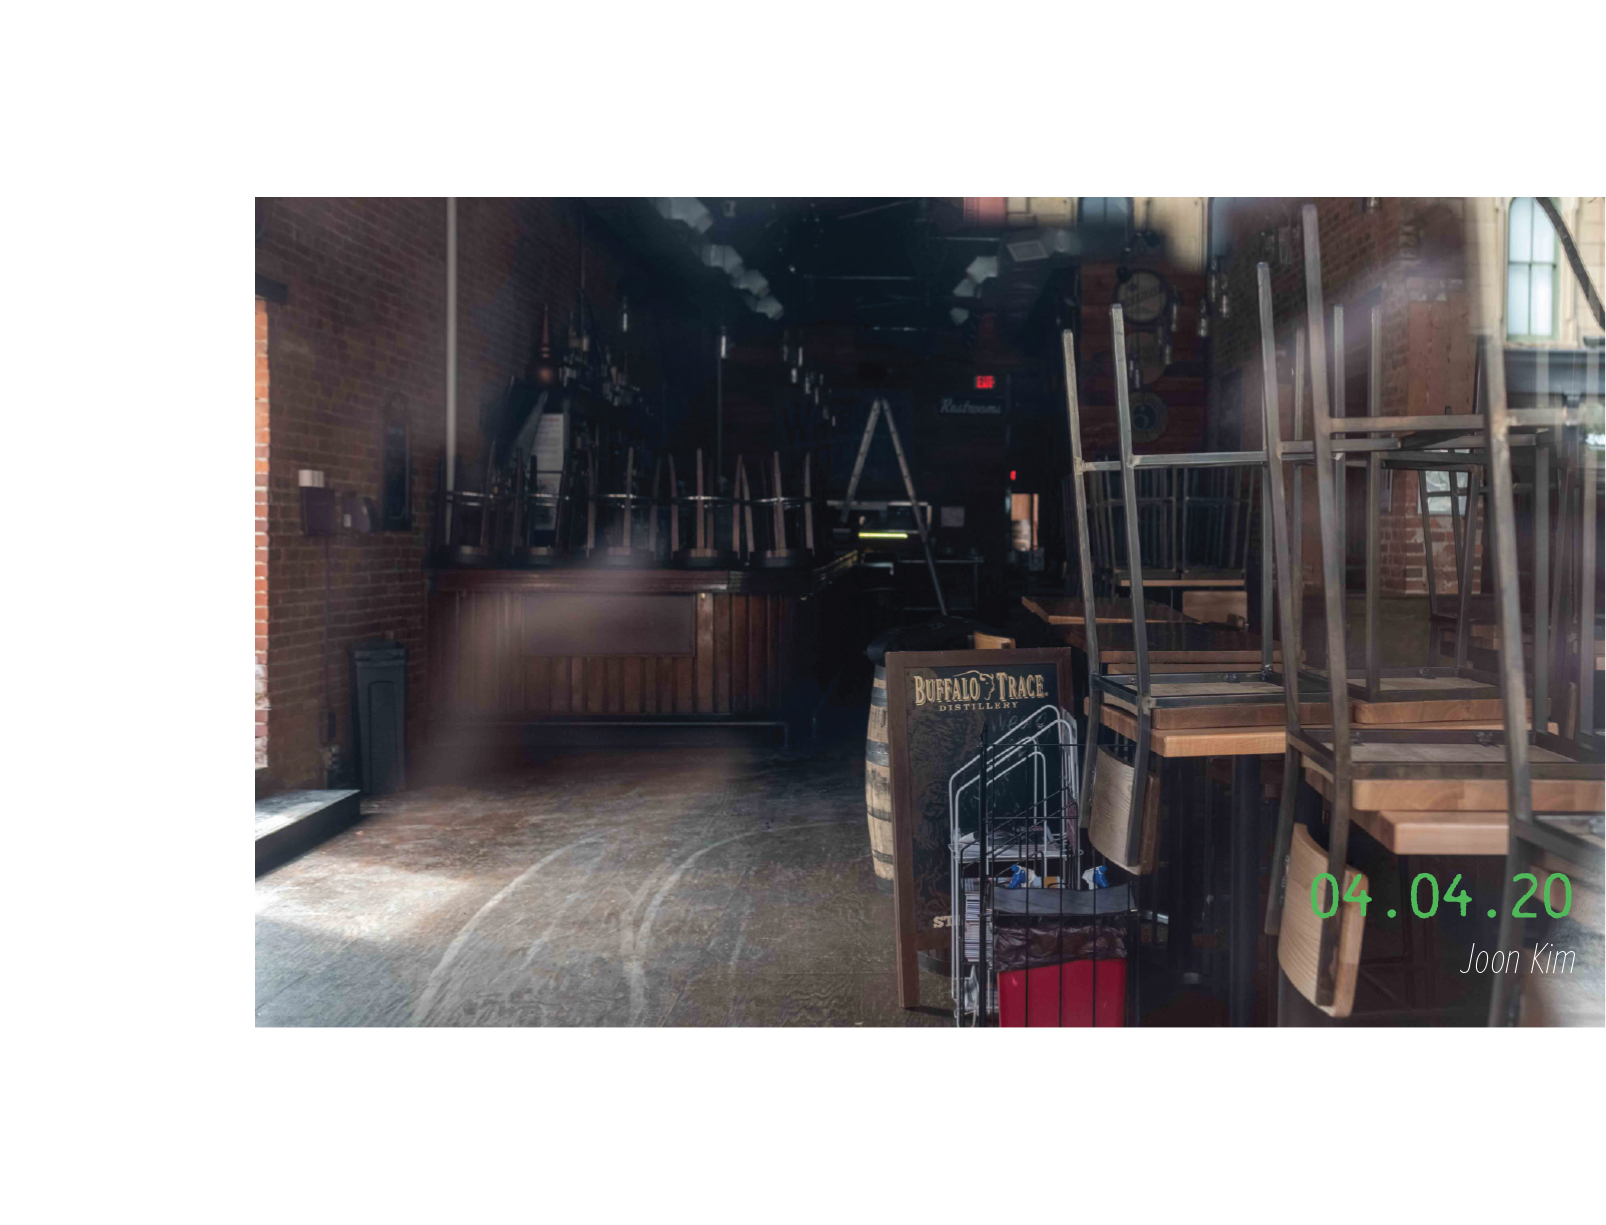 An empty bar. 04.04.2020, by Joon Kim